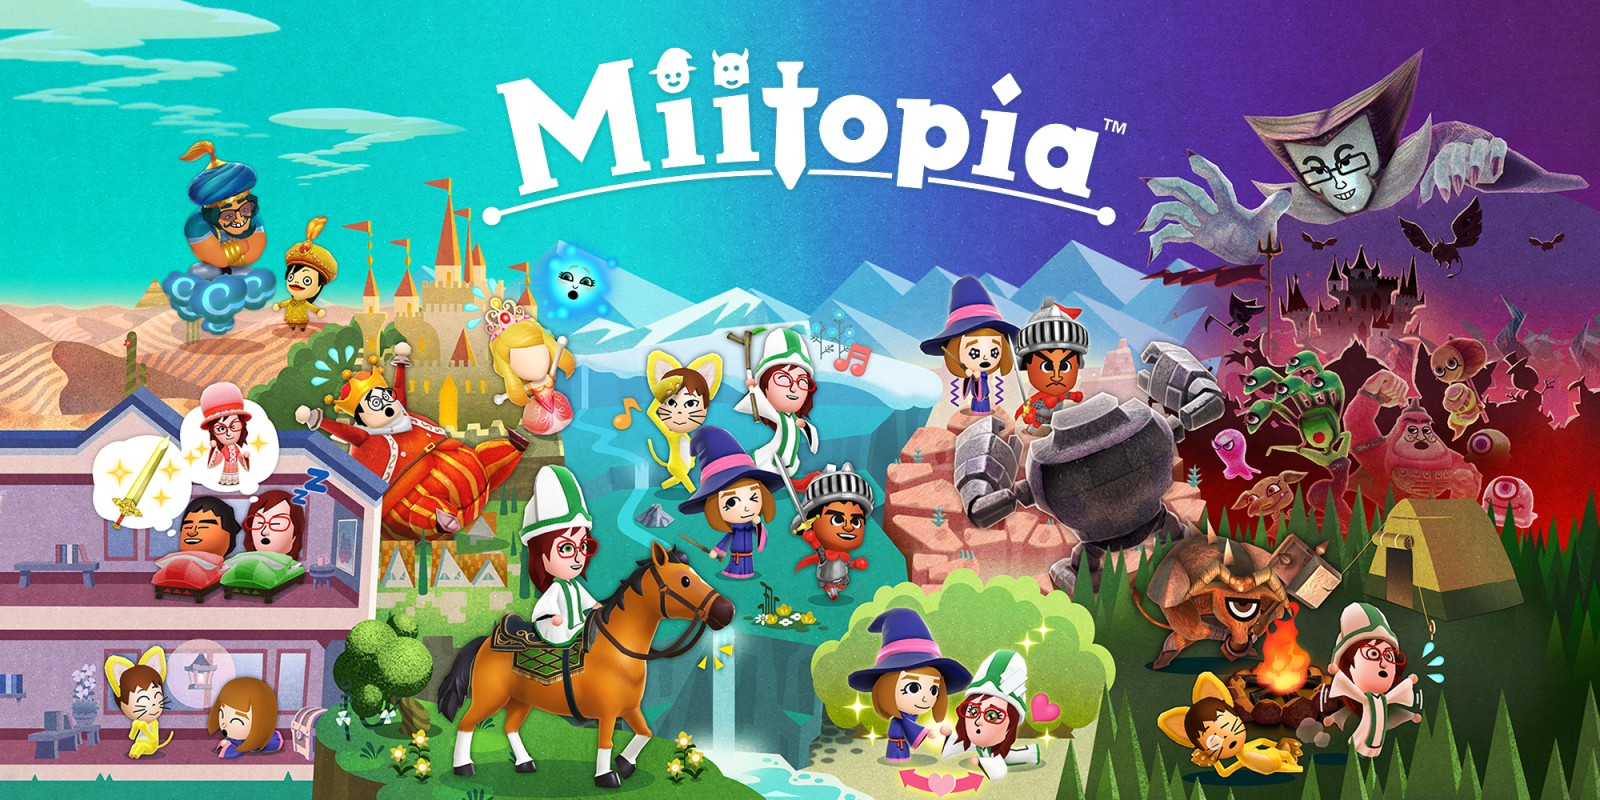 Miitopia | Nintendo Switch | Games | Nintendo